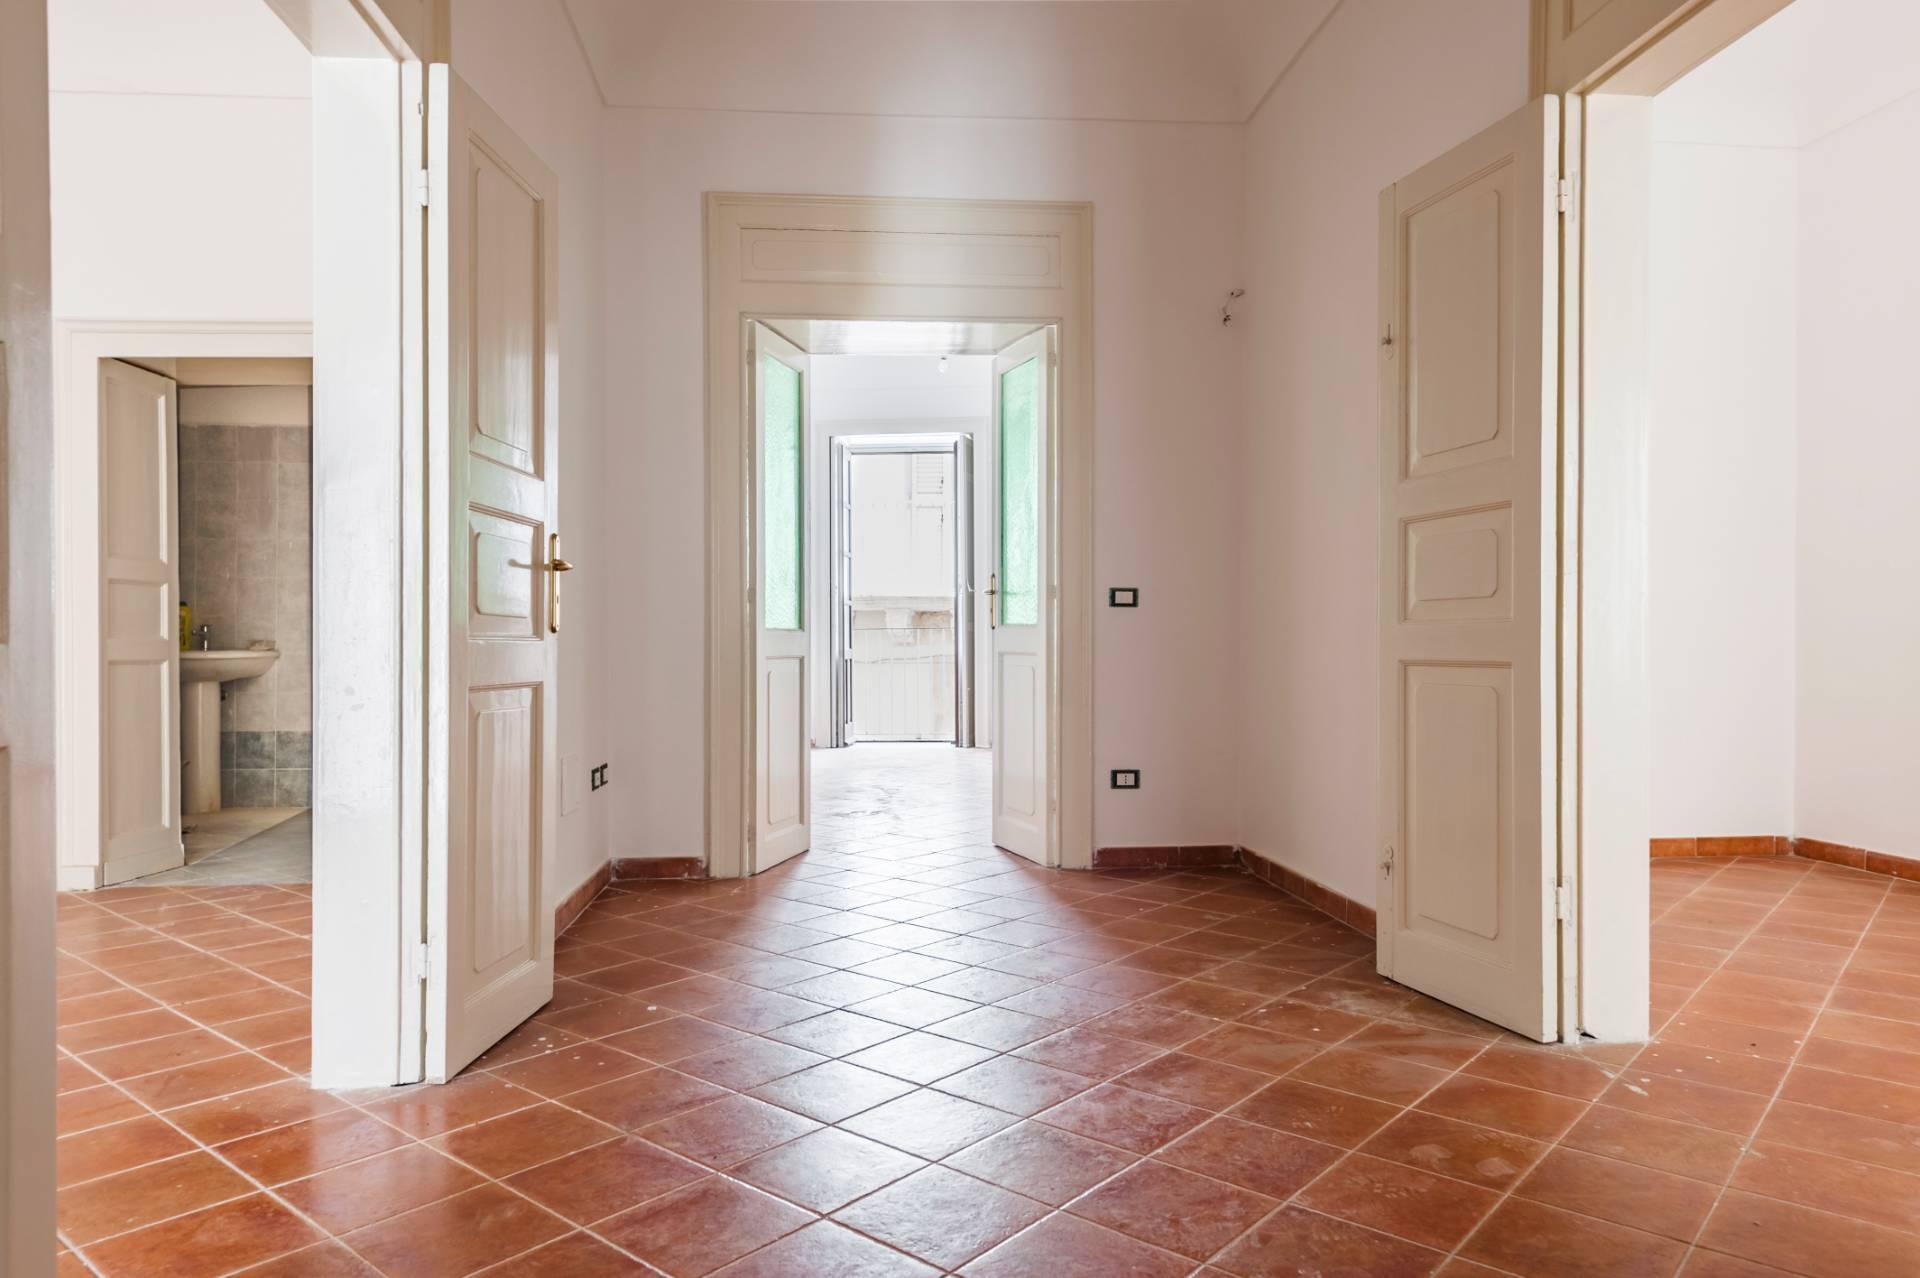 Palazzo in Vendita a Siracusa: 5 locali, 500 mq - Foto 1